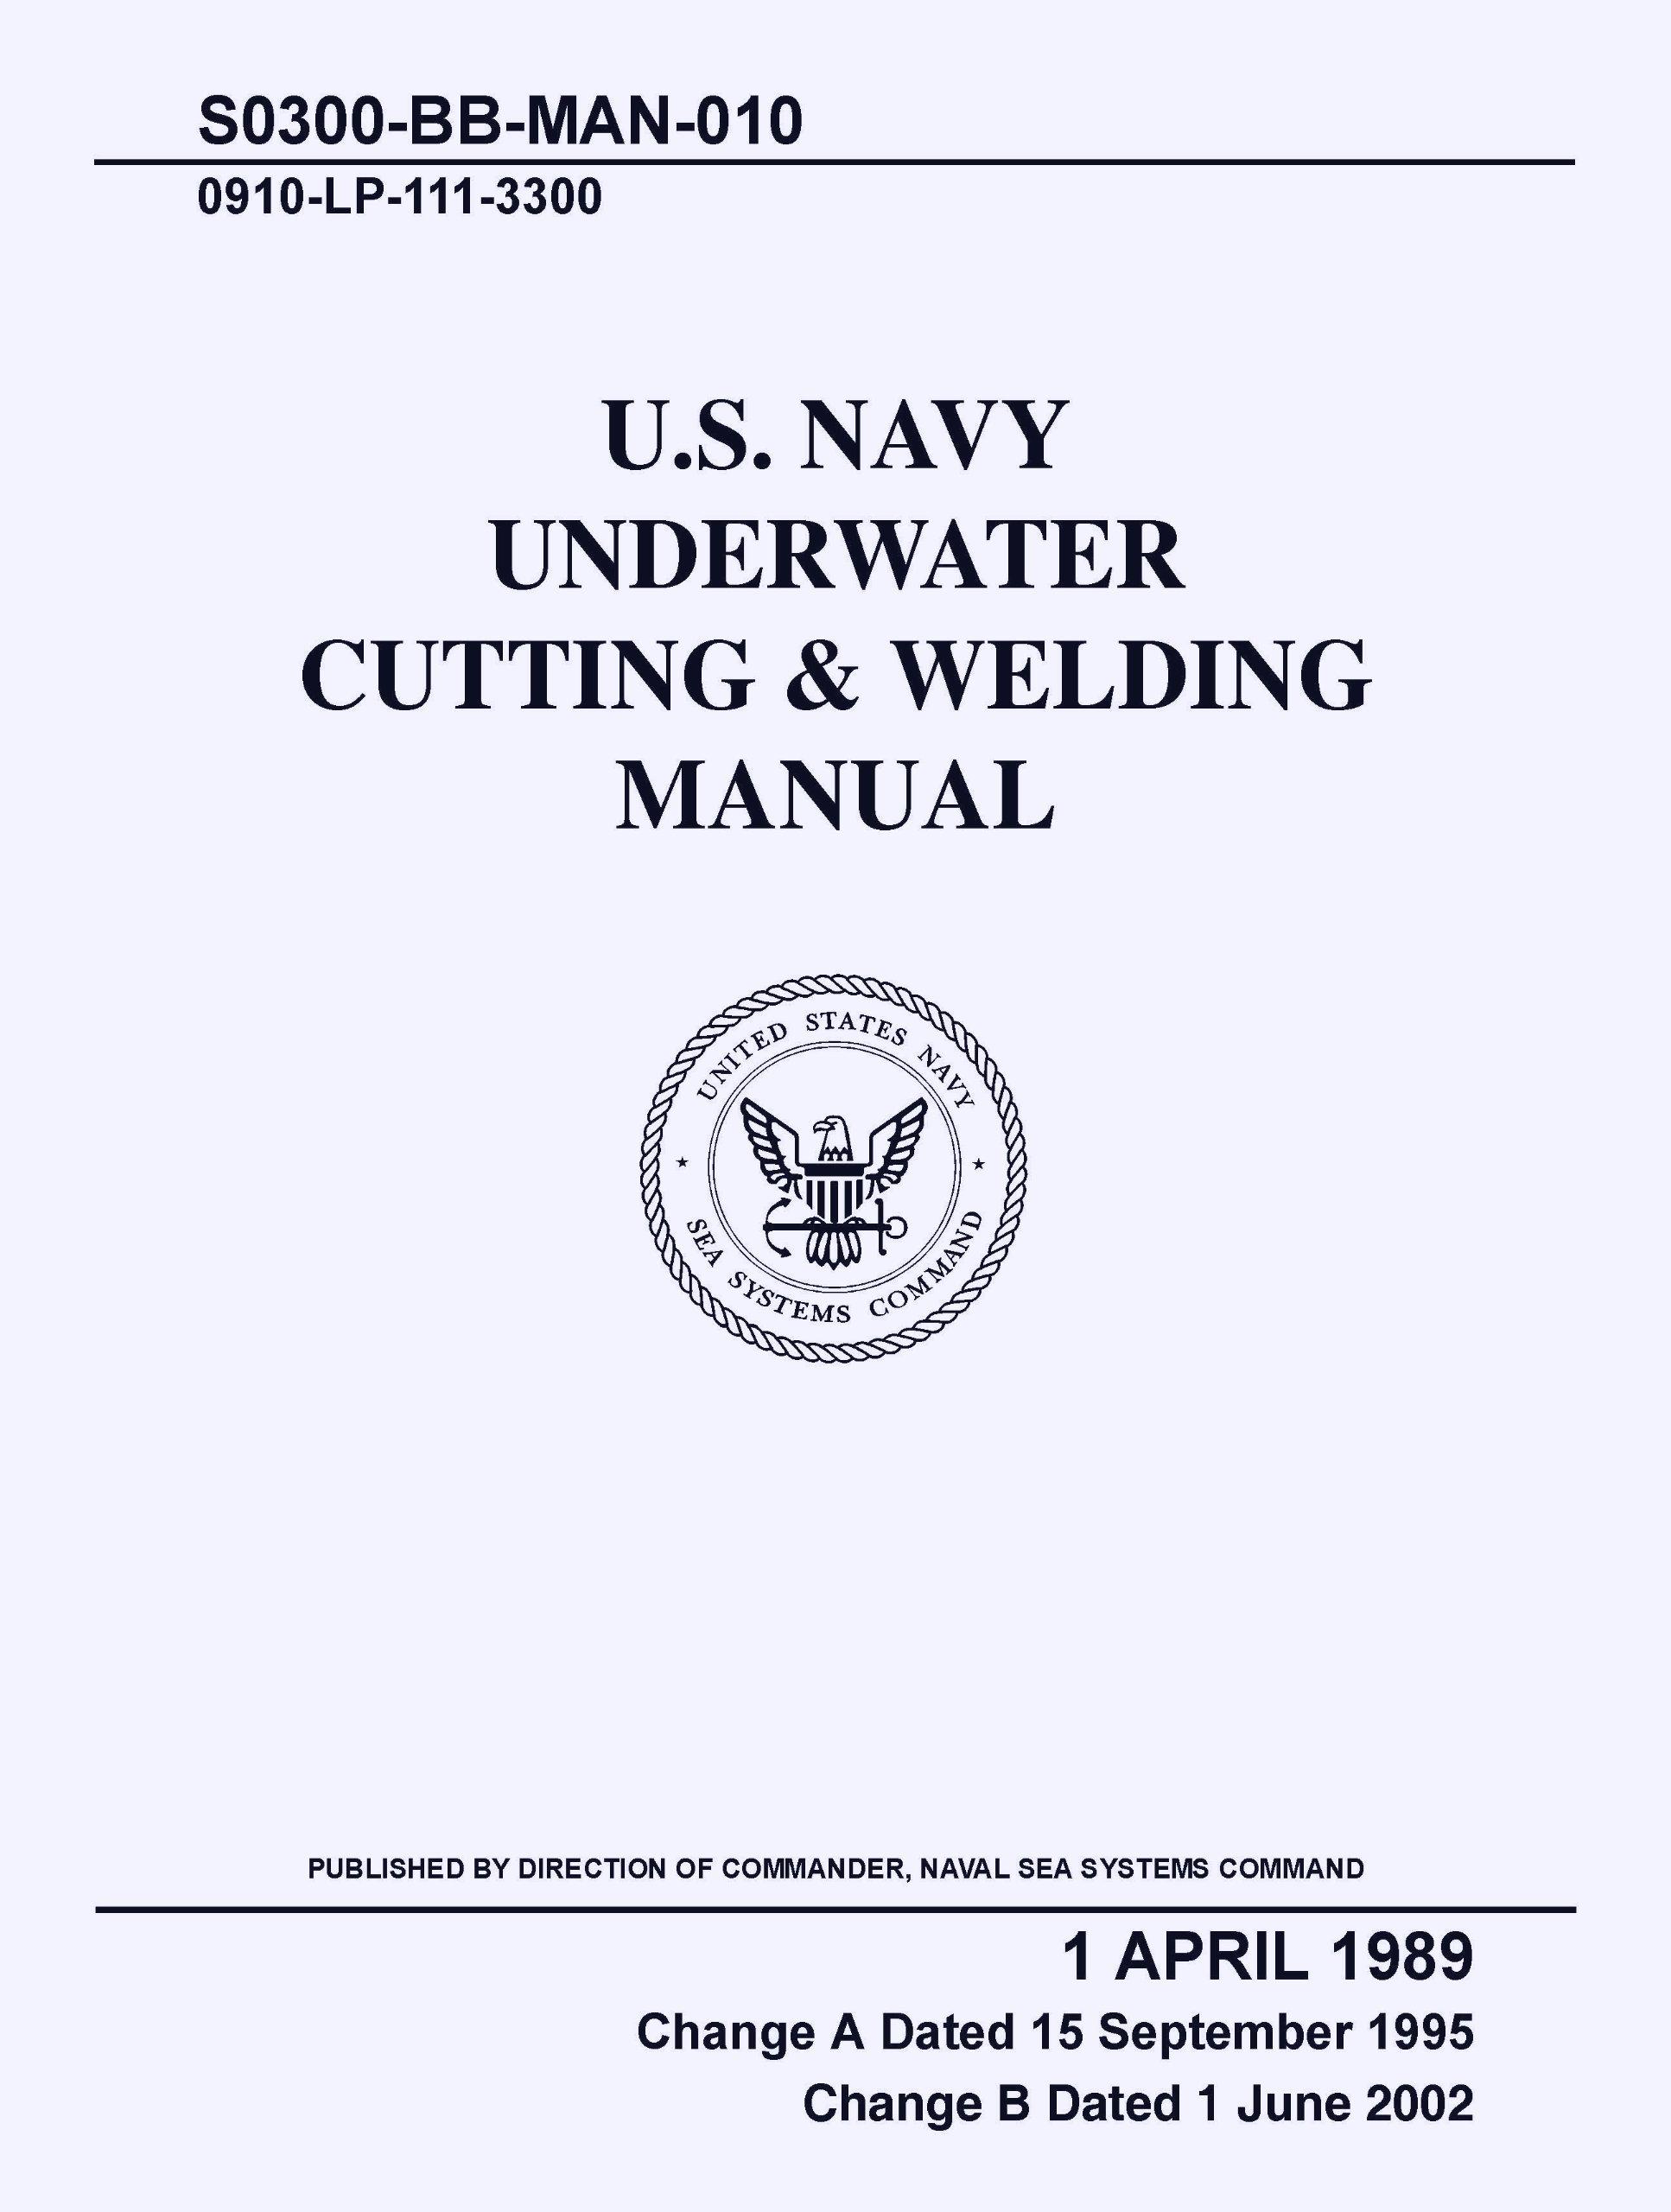 U.S. NAVY UNDERWATER CUTTING AND WELDING MANUAL 2002 S0300-BB-MAN-010